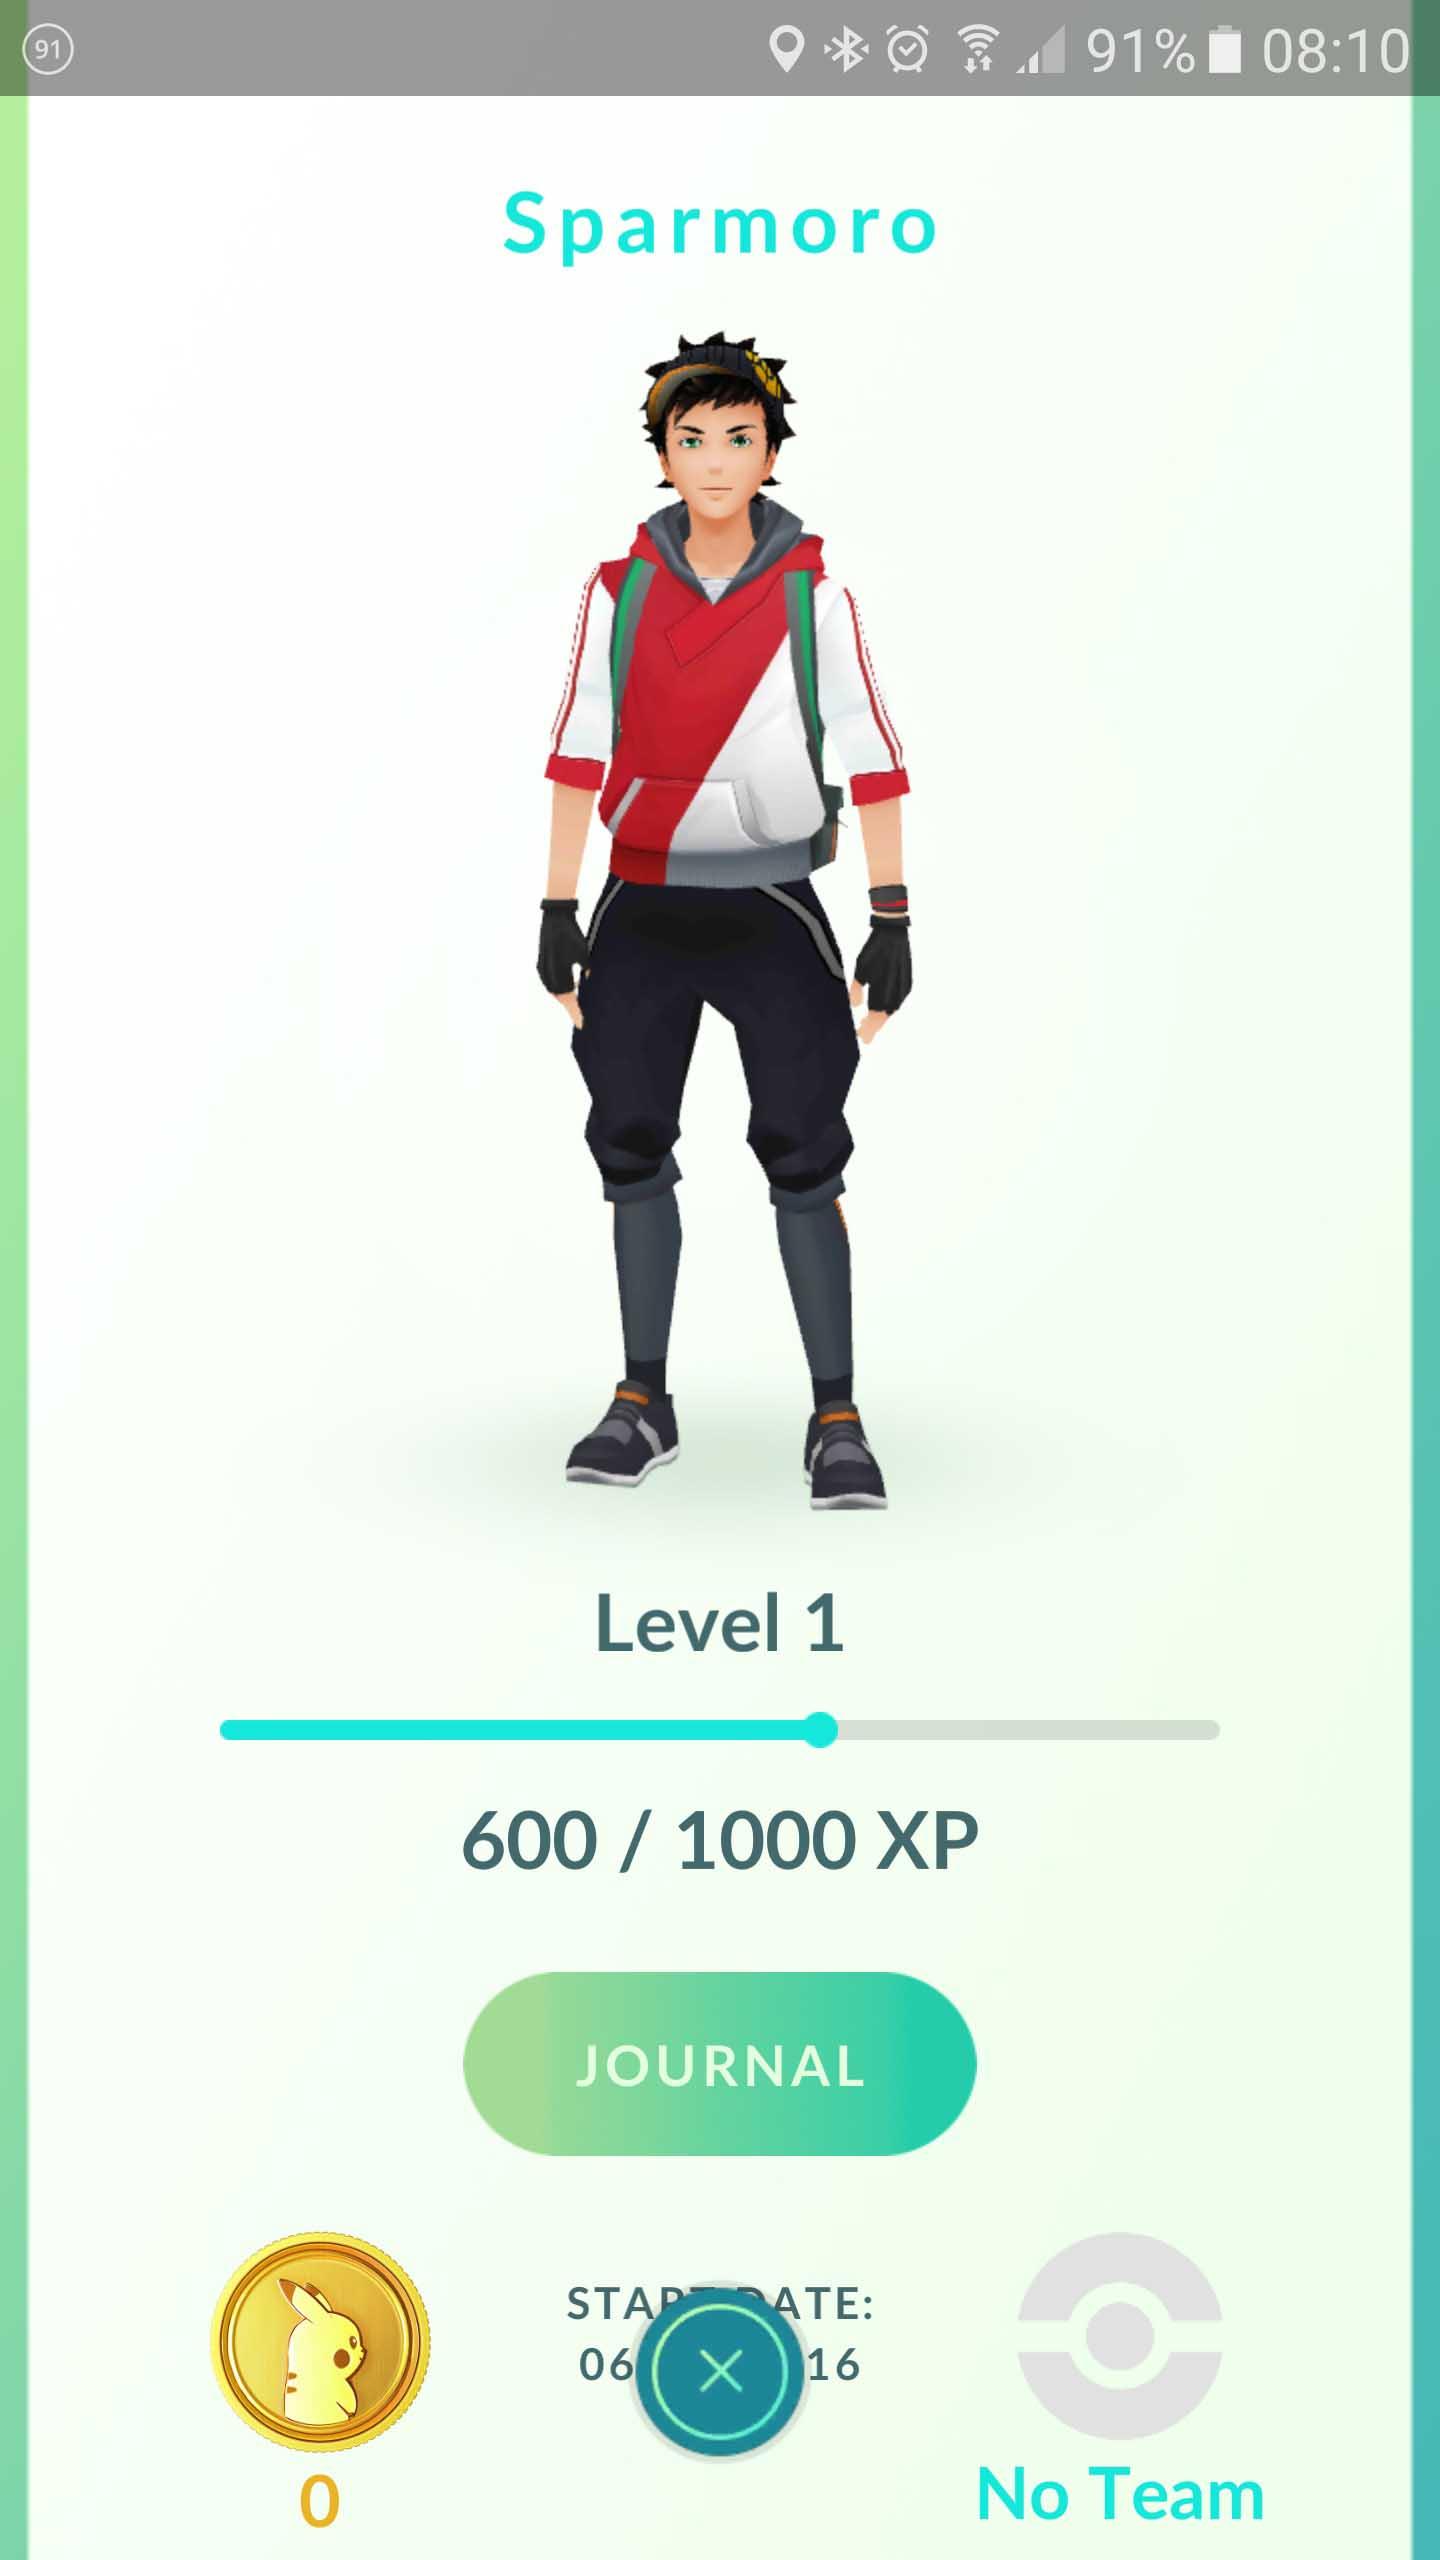 Pokémon Go Personnage.jpg